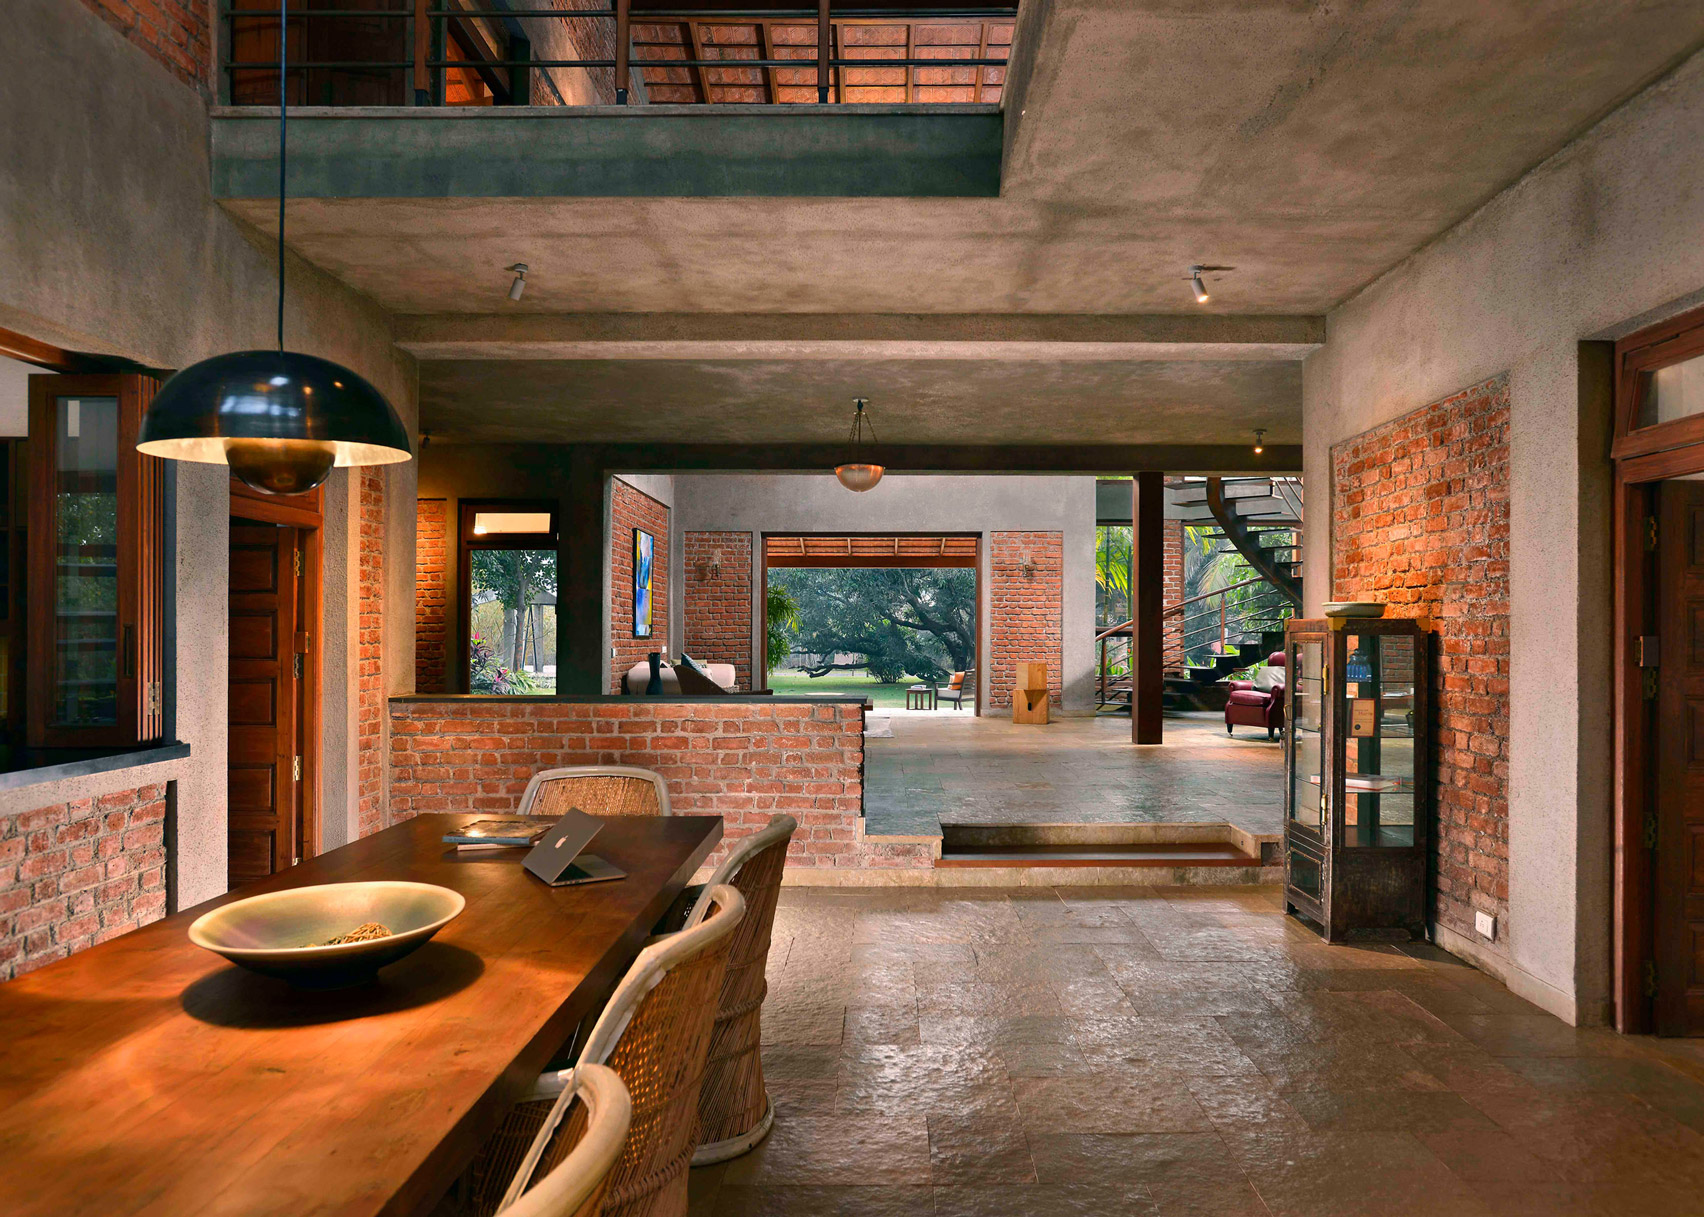 The Mango House by Studio PKA